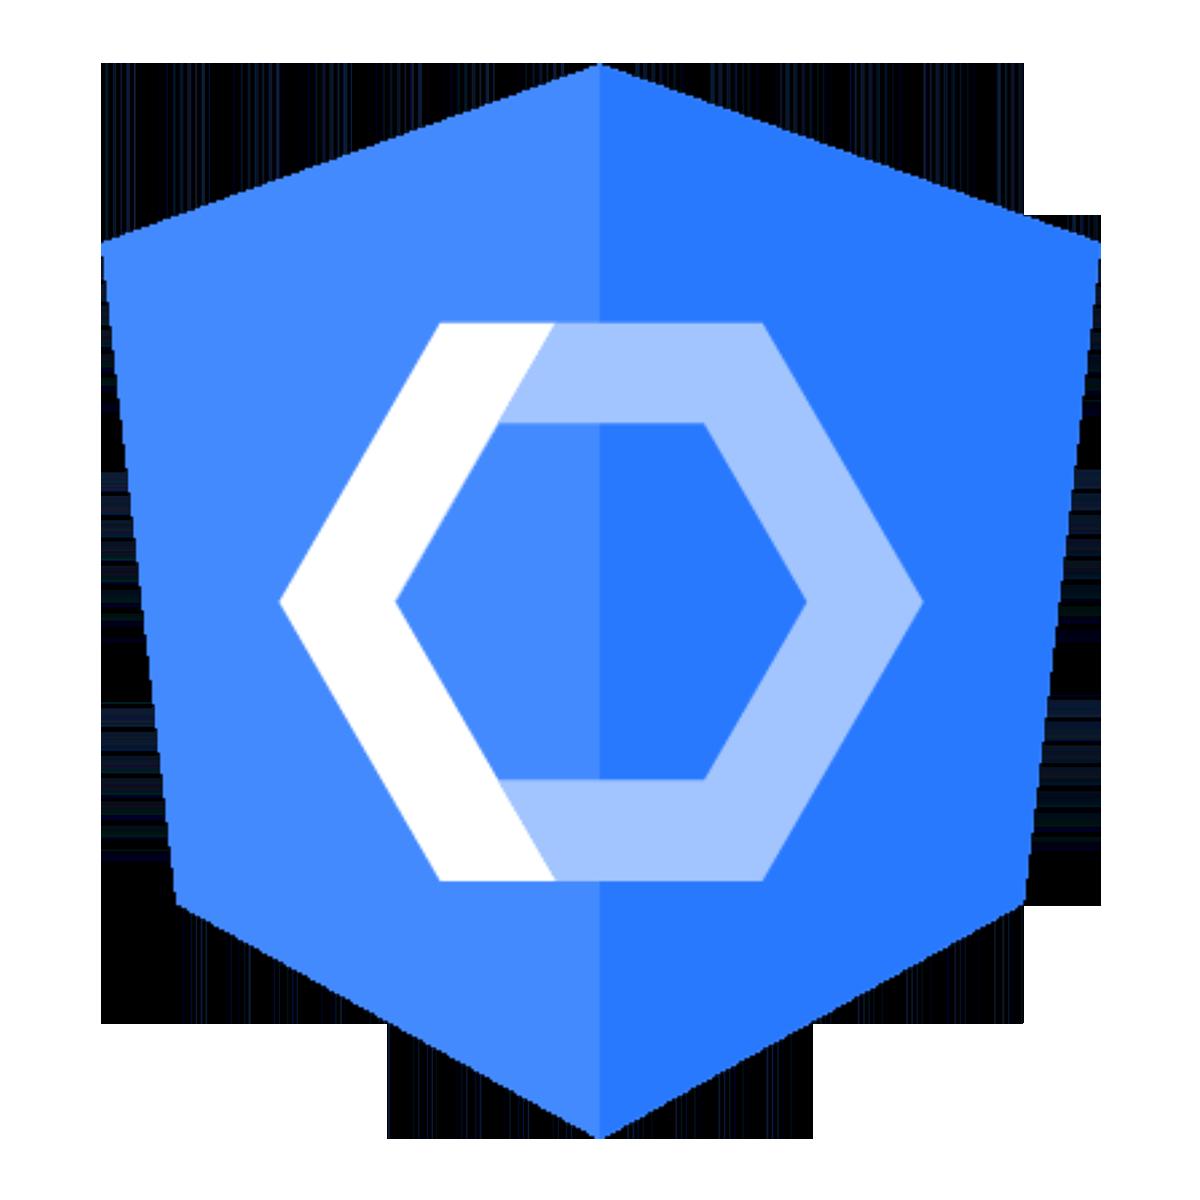 The logo of Angular Elements